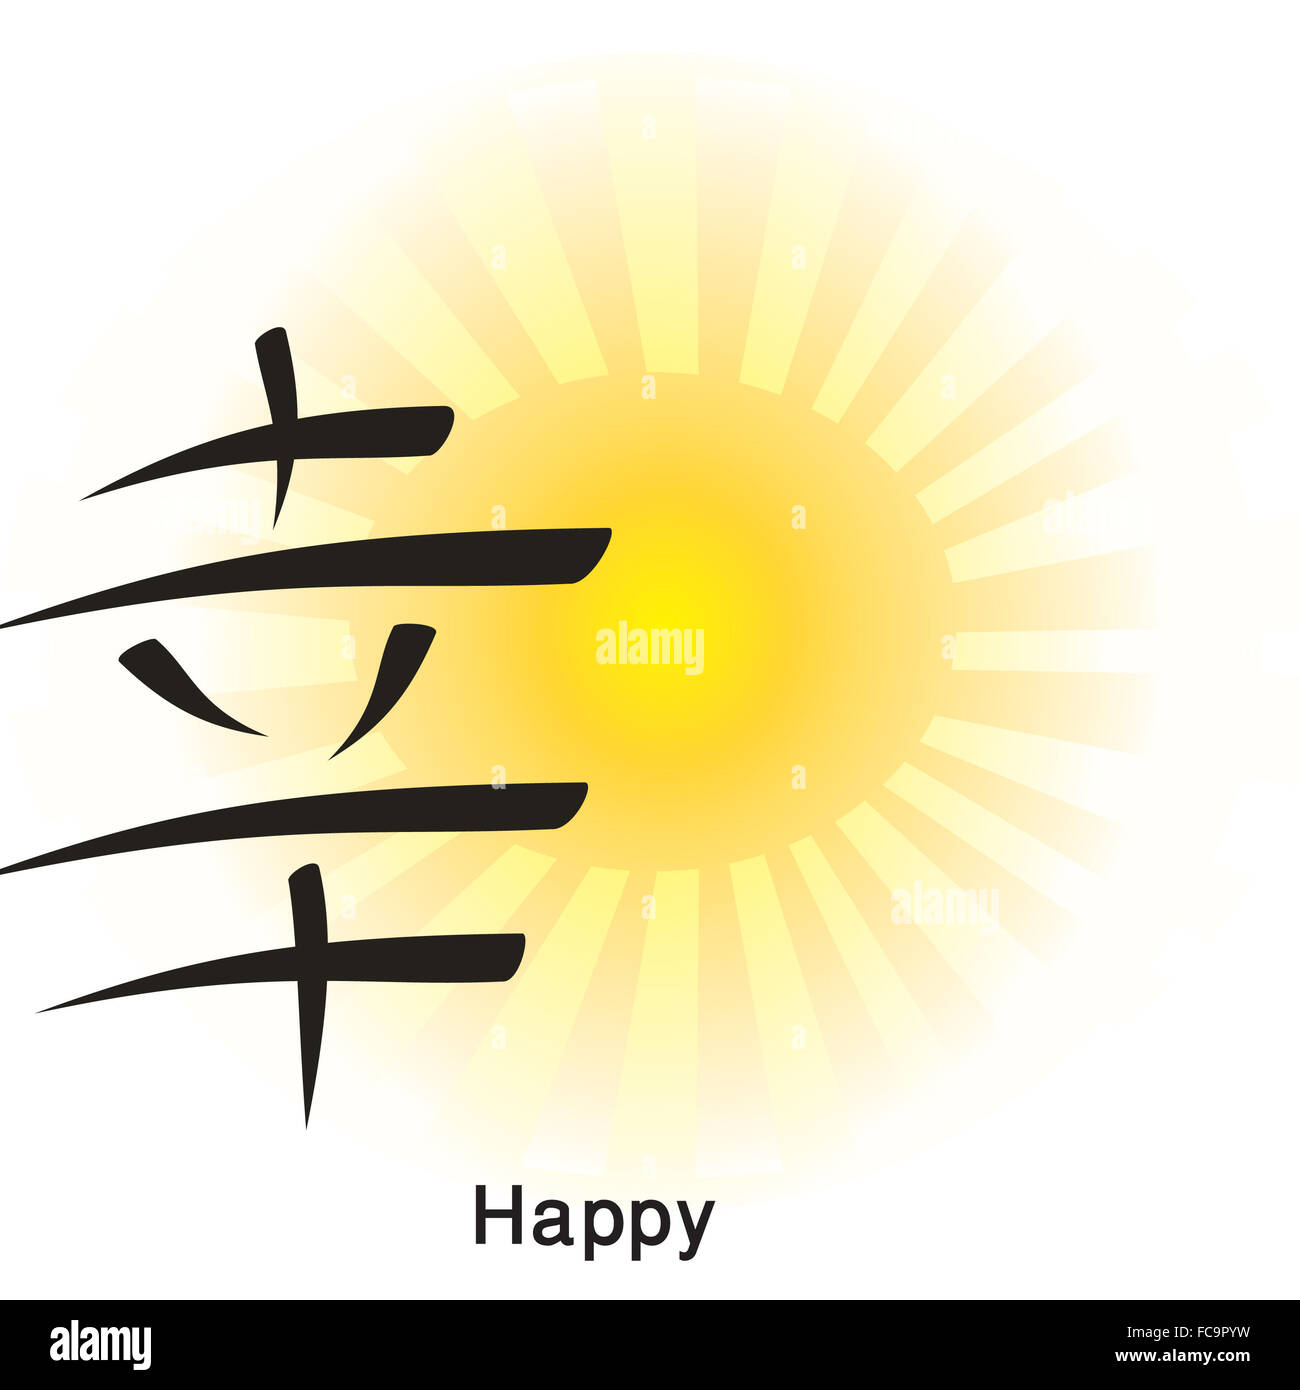 Japanese hieroglyph - Stock Image